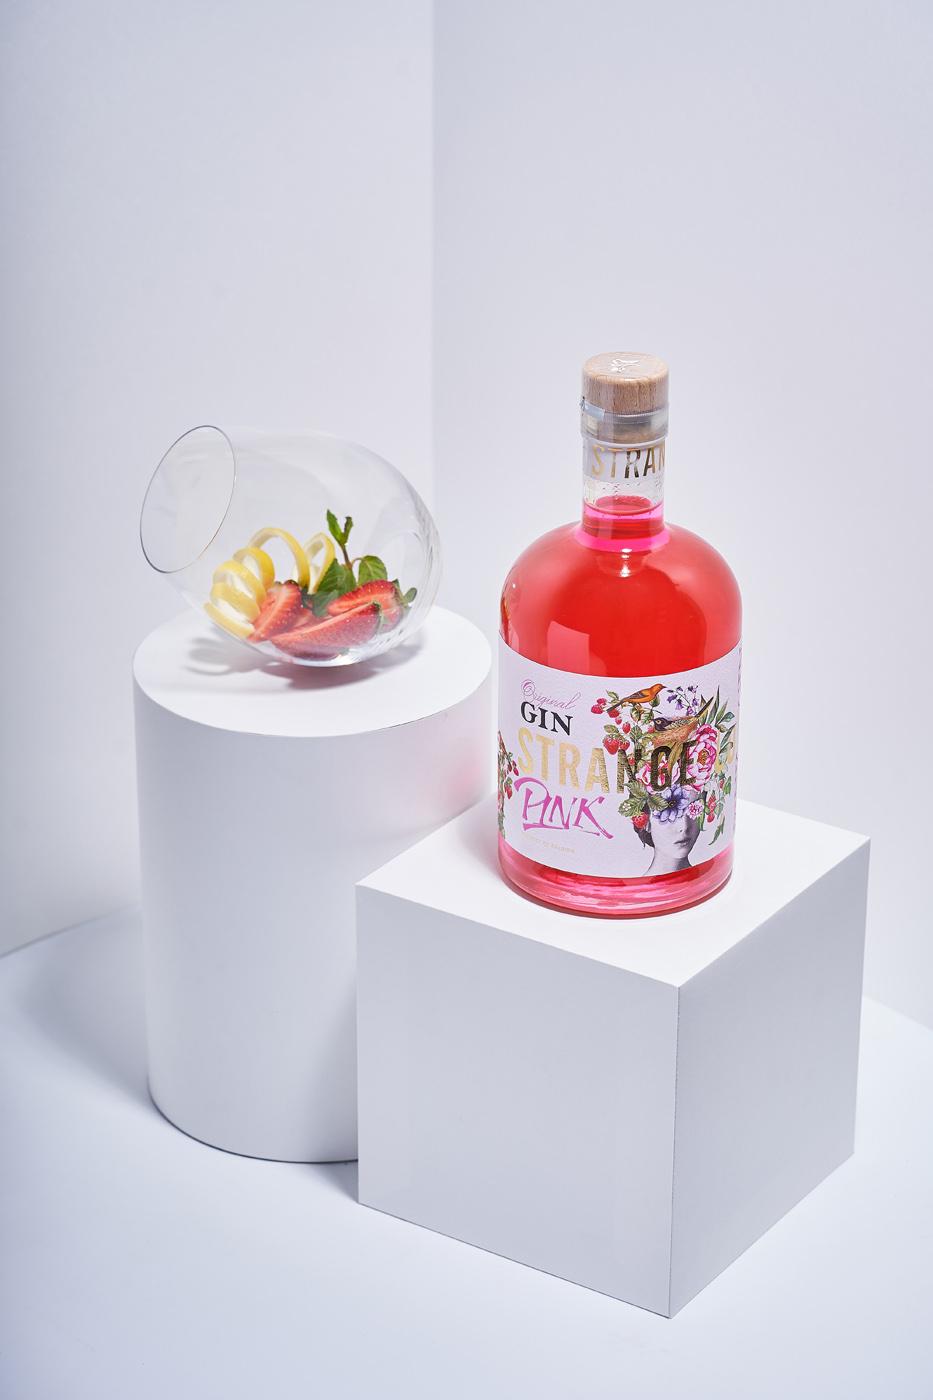 43oz.com Design Studio Create Craft Gin Label Design for Strange Luve Pink